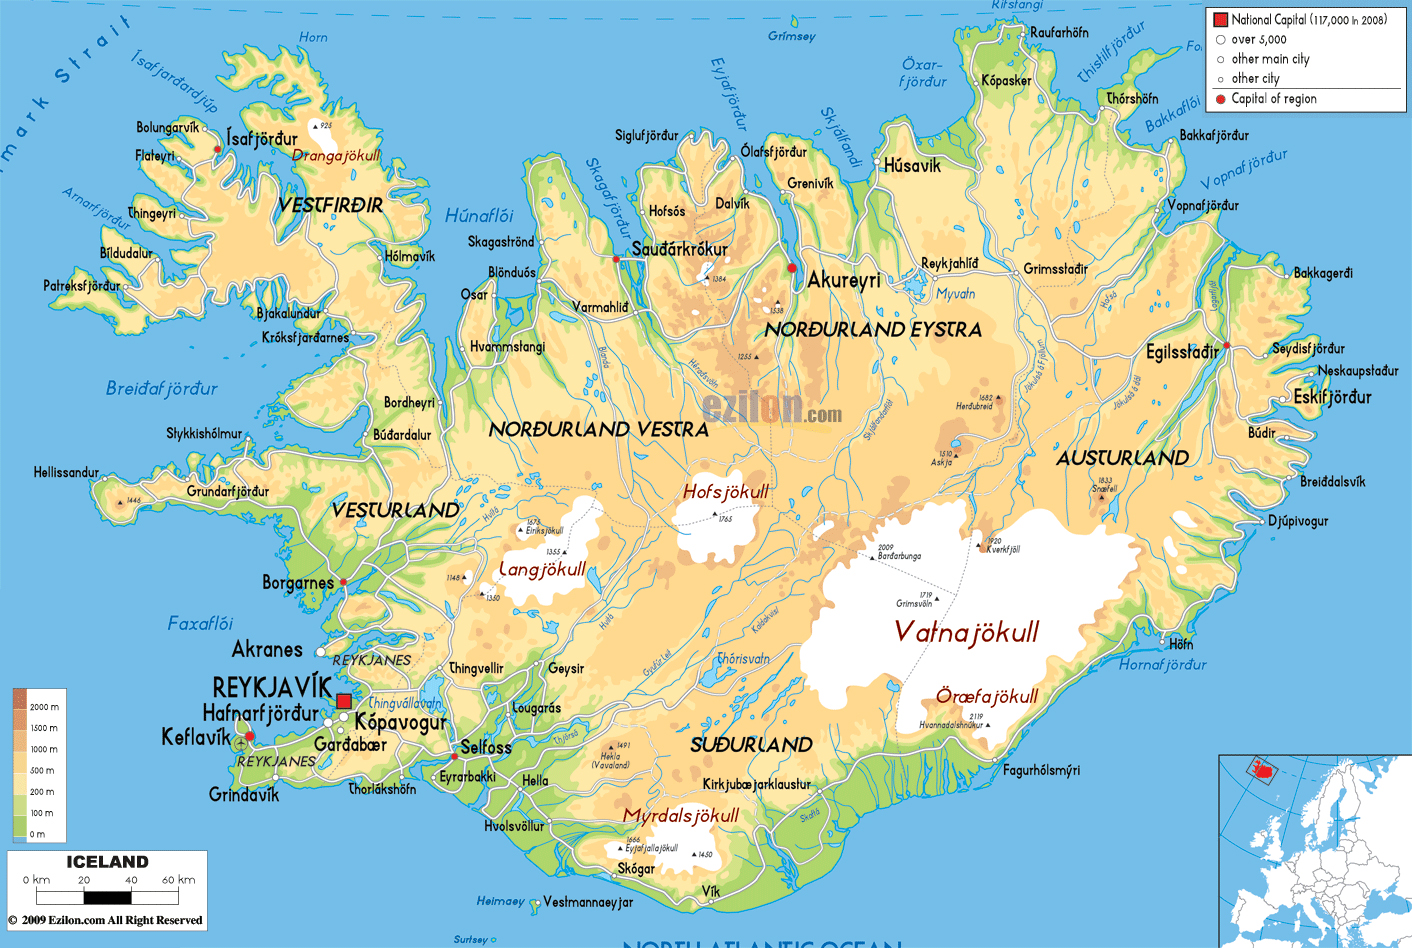 Islândia | Mapas Geográficos da Islândia